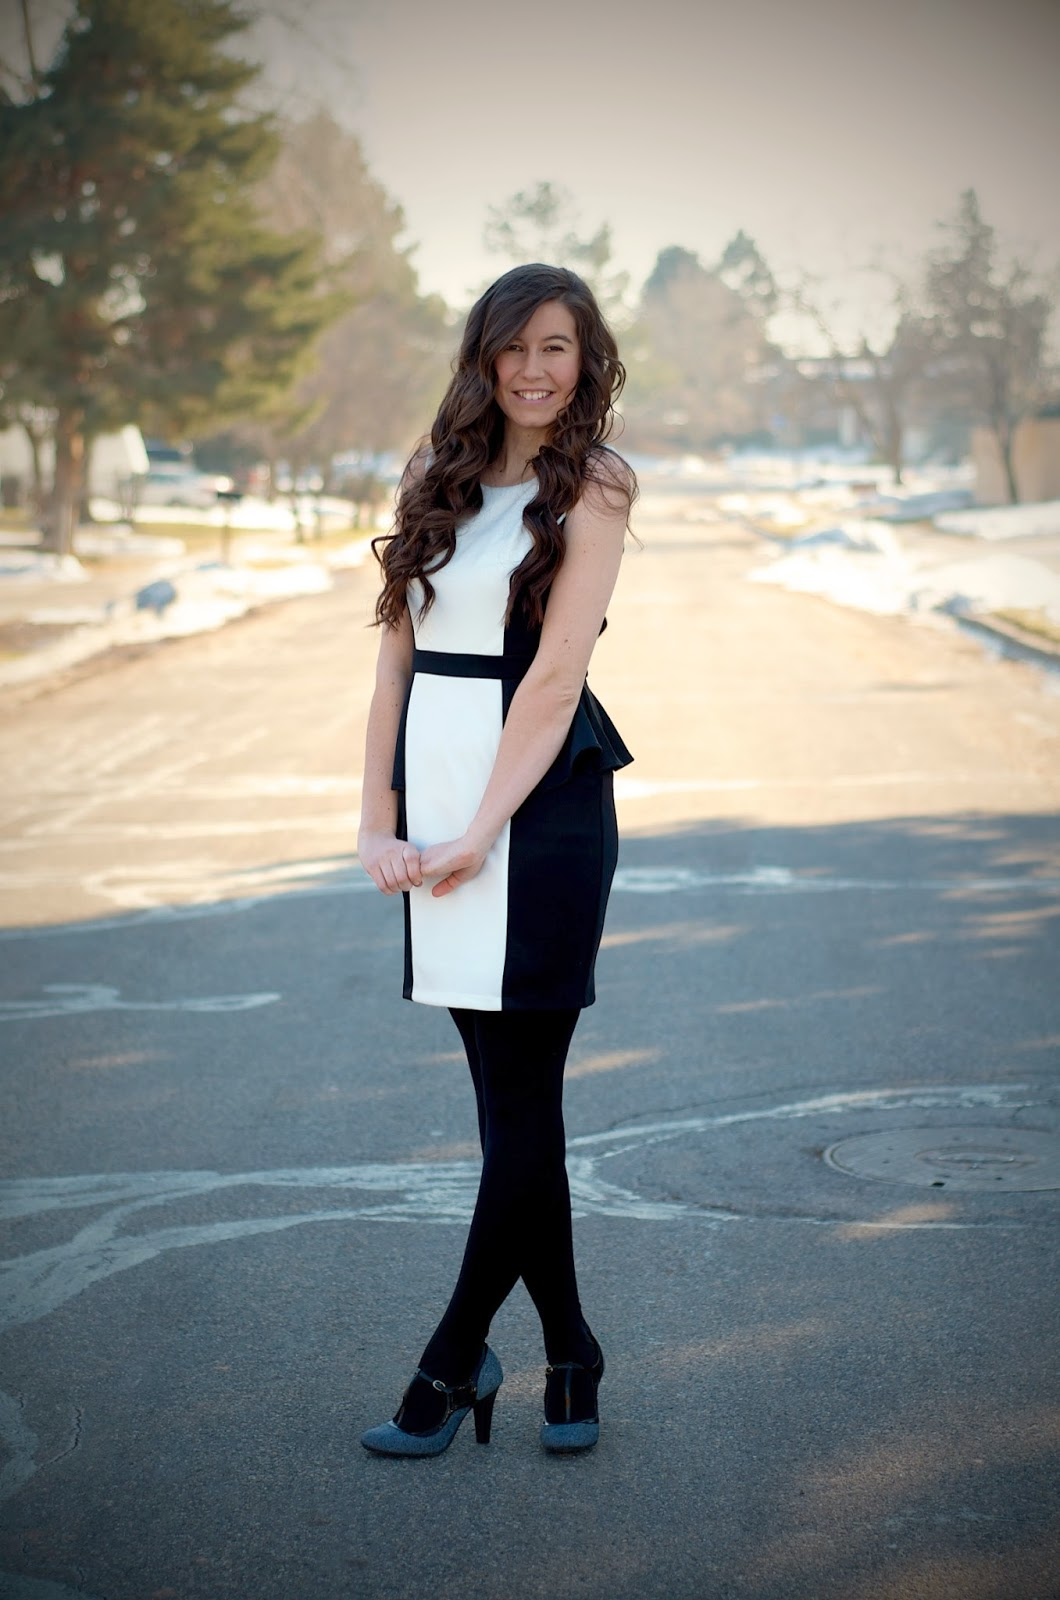 black and white dress, black and white peplum dress, dress, eliason photography, peplum, peplum dress, edward eliason photography, pretty dress, long curly hair, wavy hair, heels, t-strap heels, tstrap heels, high heels,